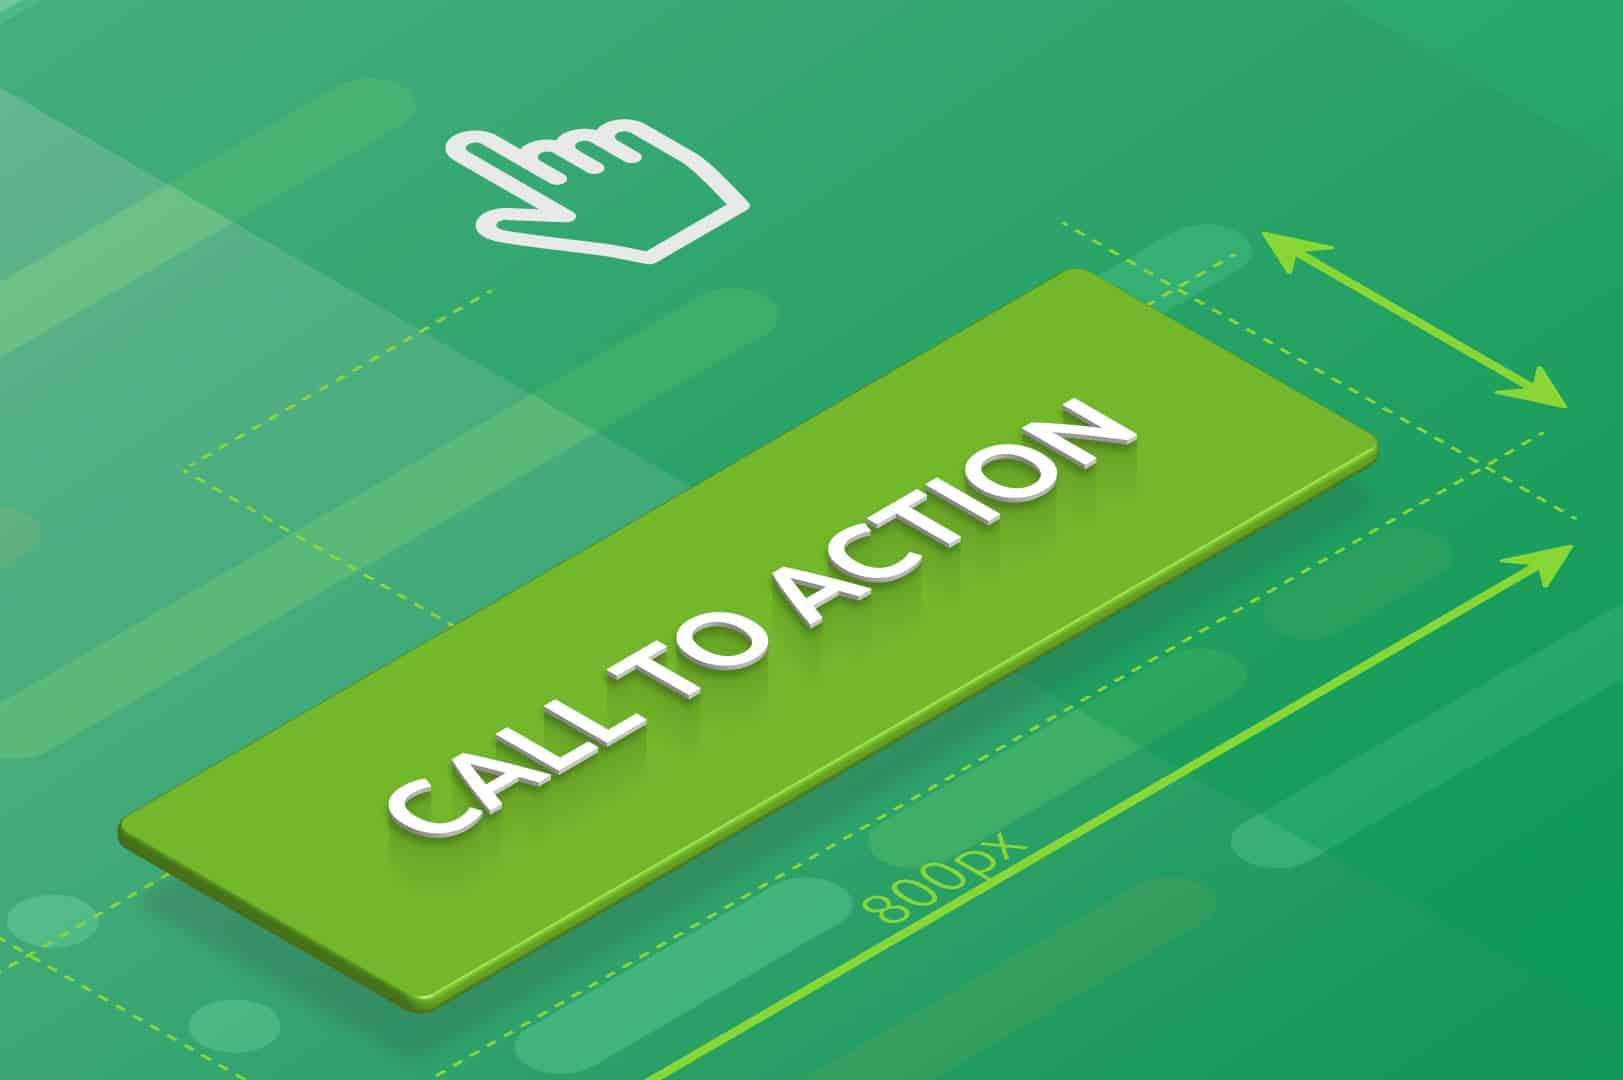 O que é Call to Action: saiba tudo sobre como criar CTAs matadores e a converter cada vez mais